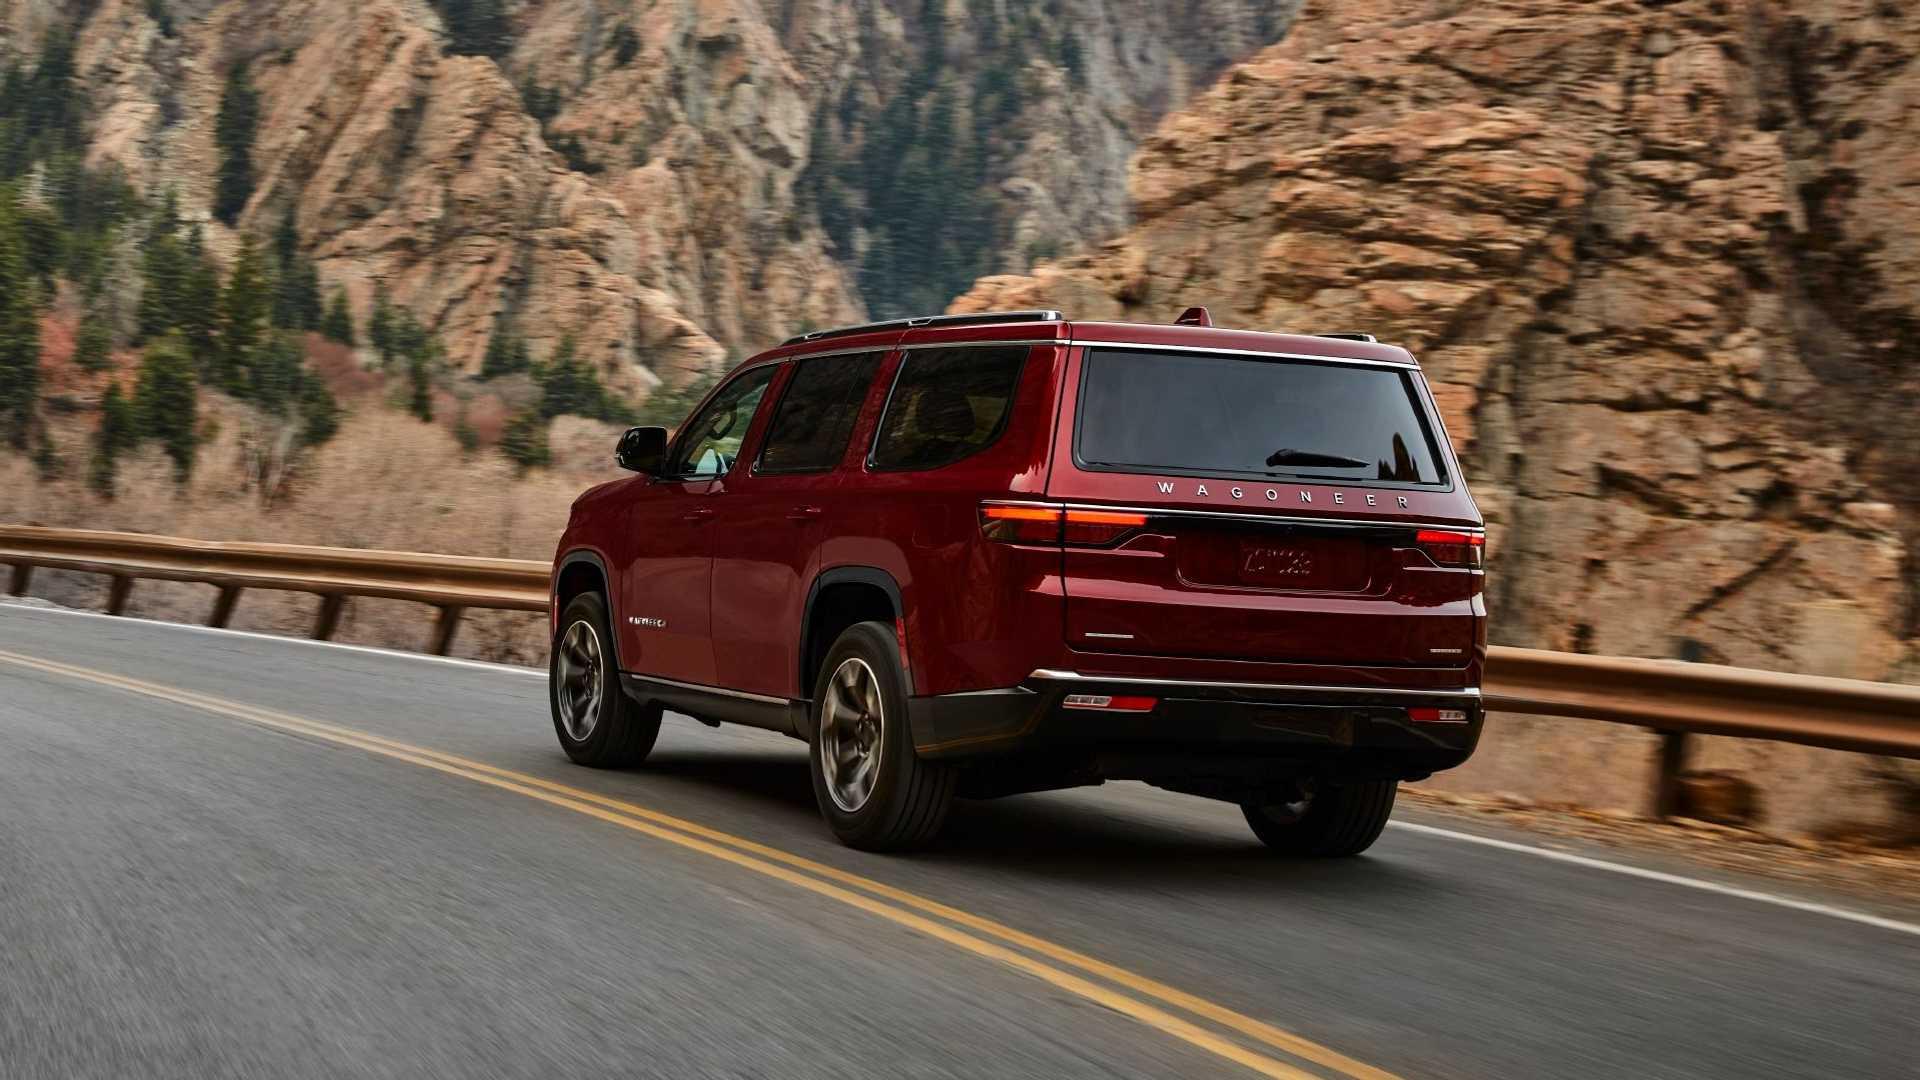 2022-jeep-wagoneer-exterior-rear-quarter-7